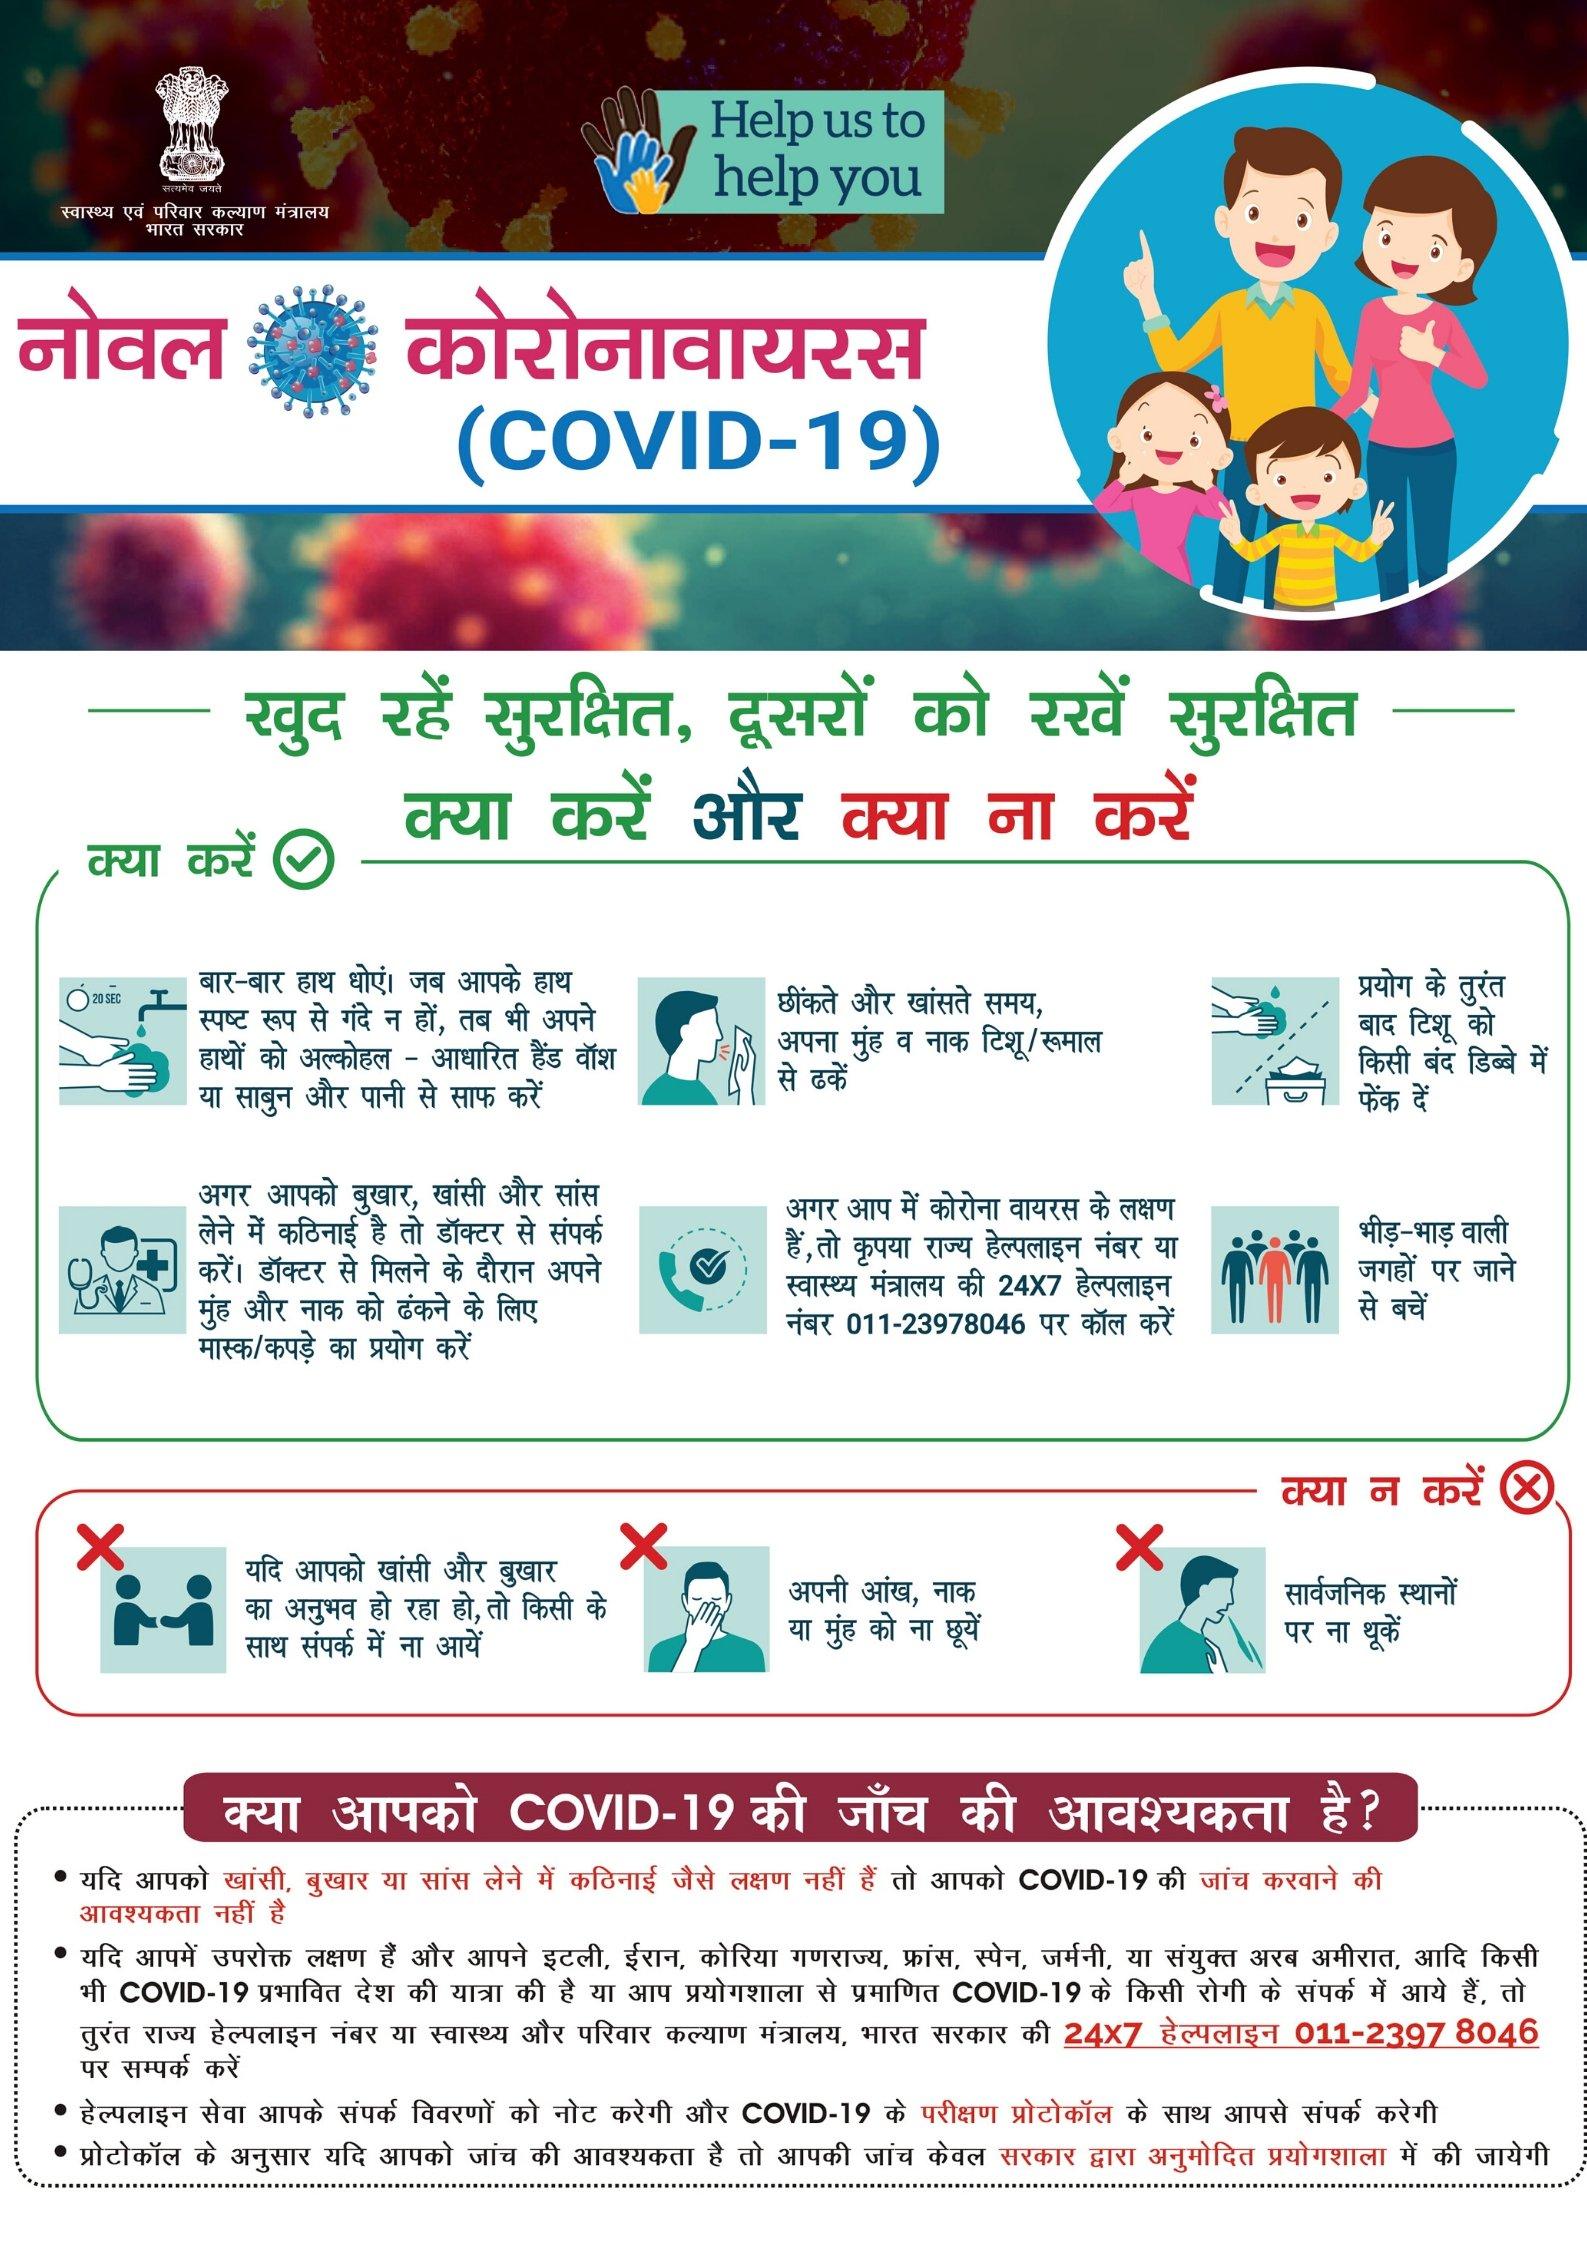 कोरोना वायरस कोविड 19